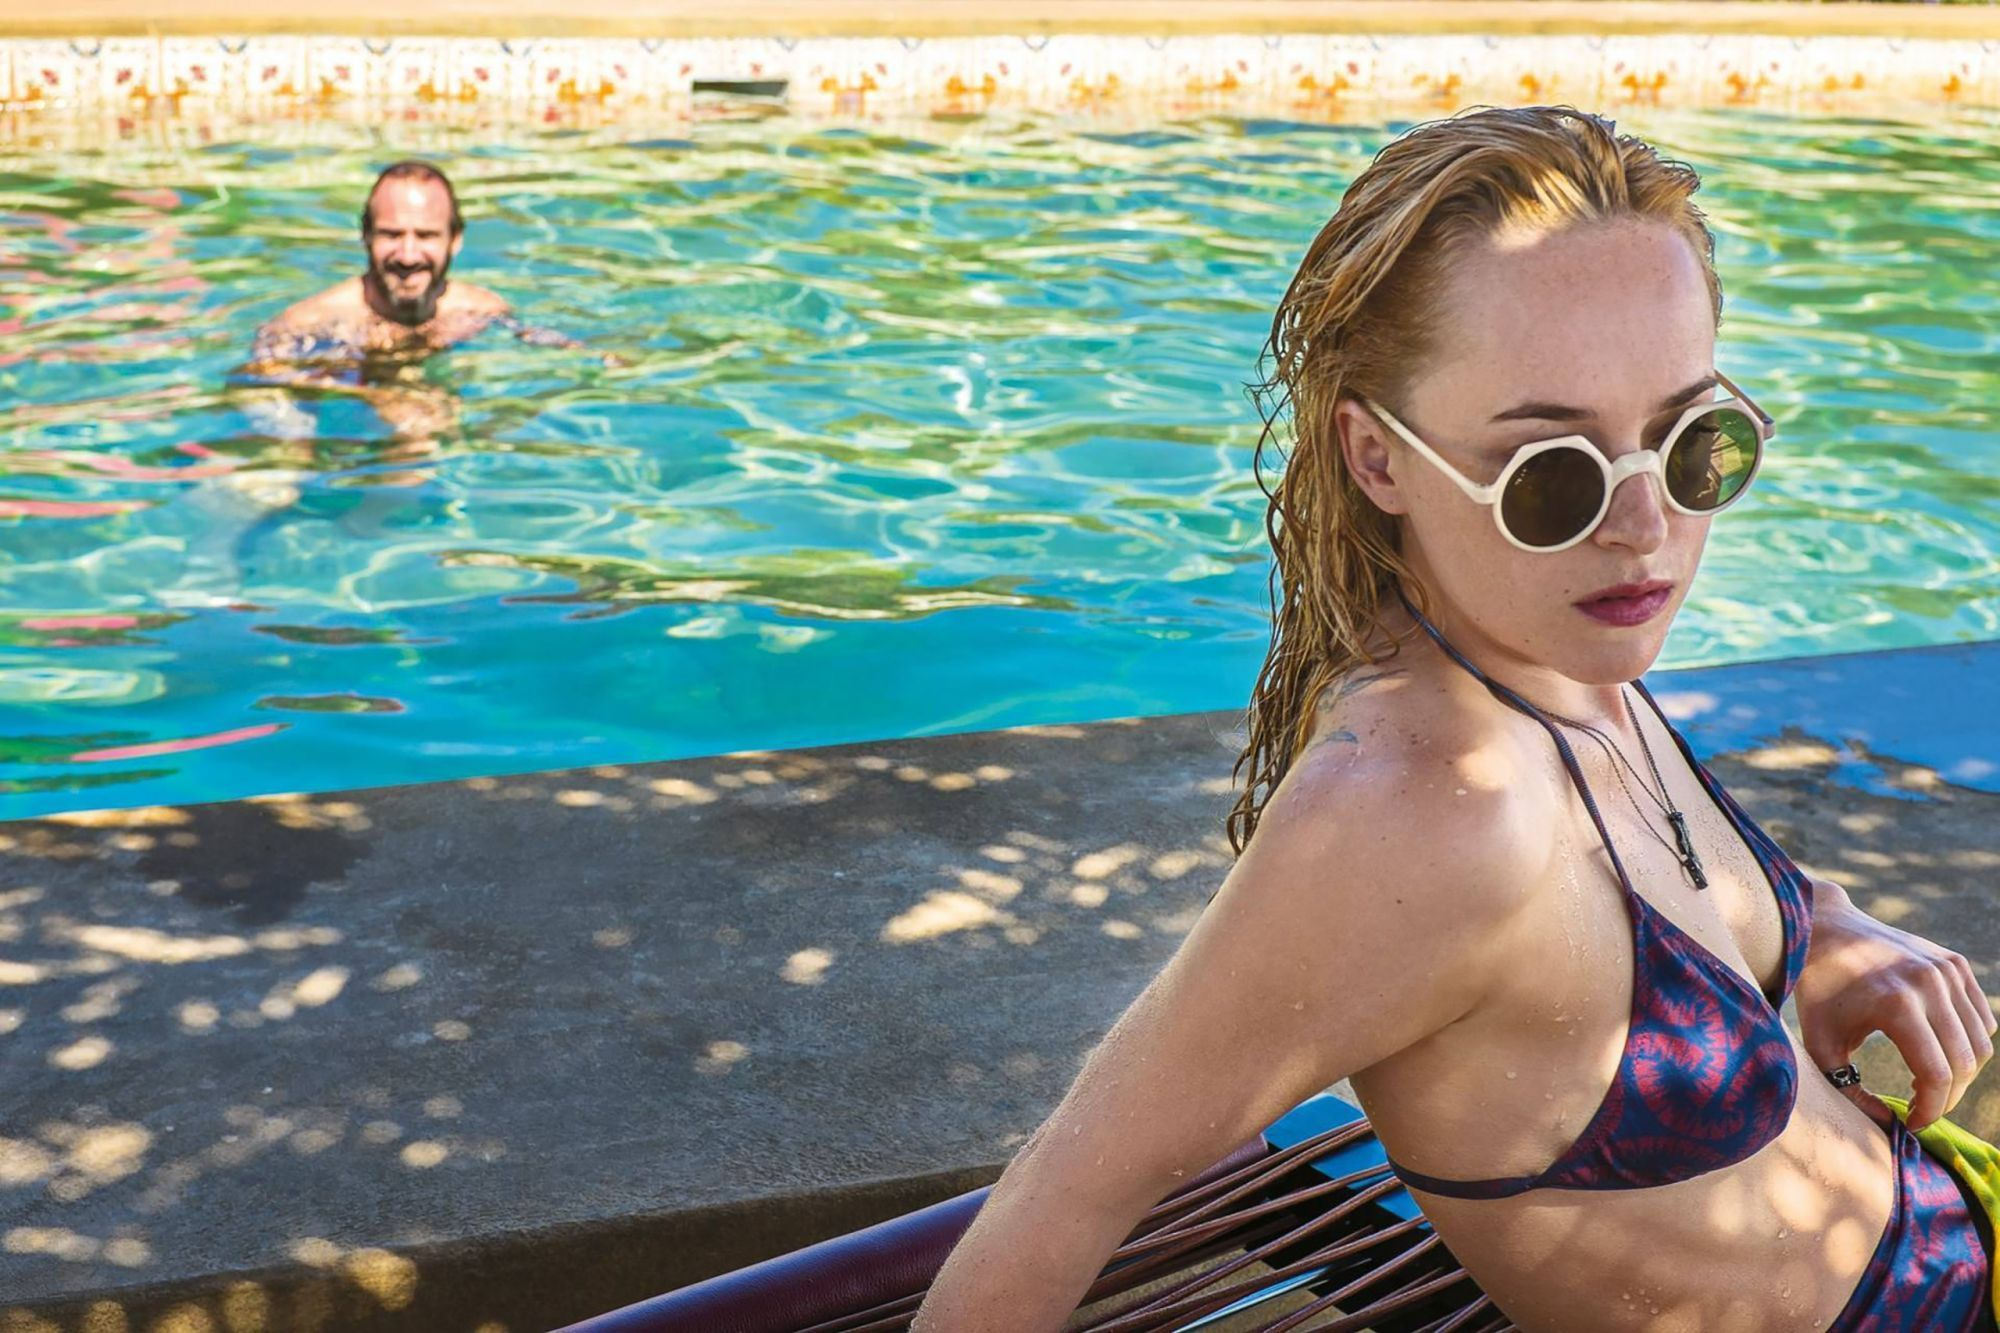 Dakota Johnson - A Bigger Splash 2015